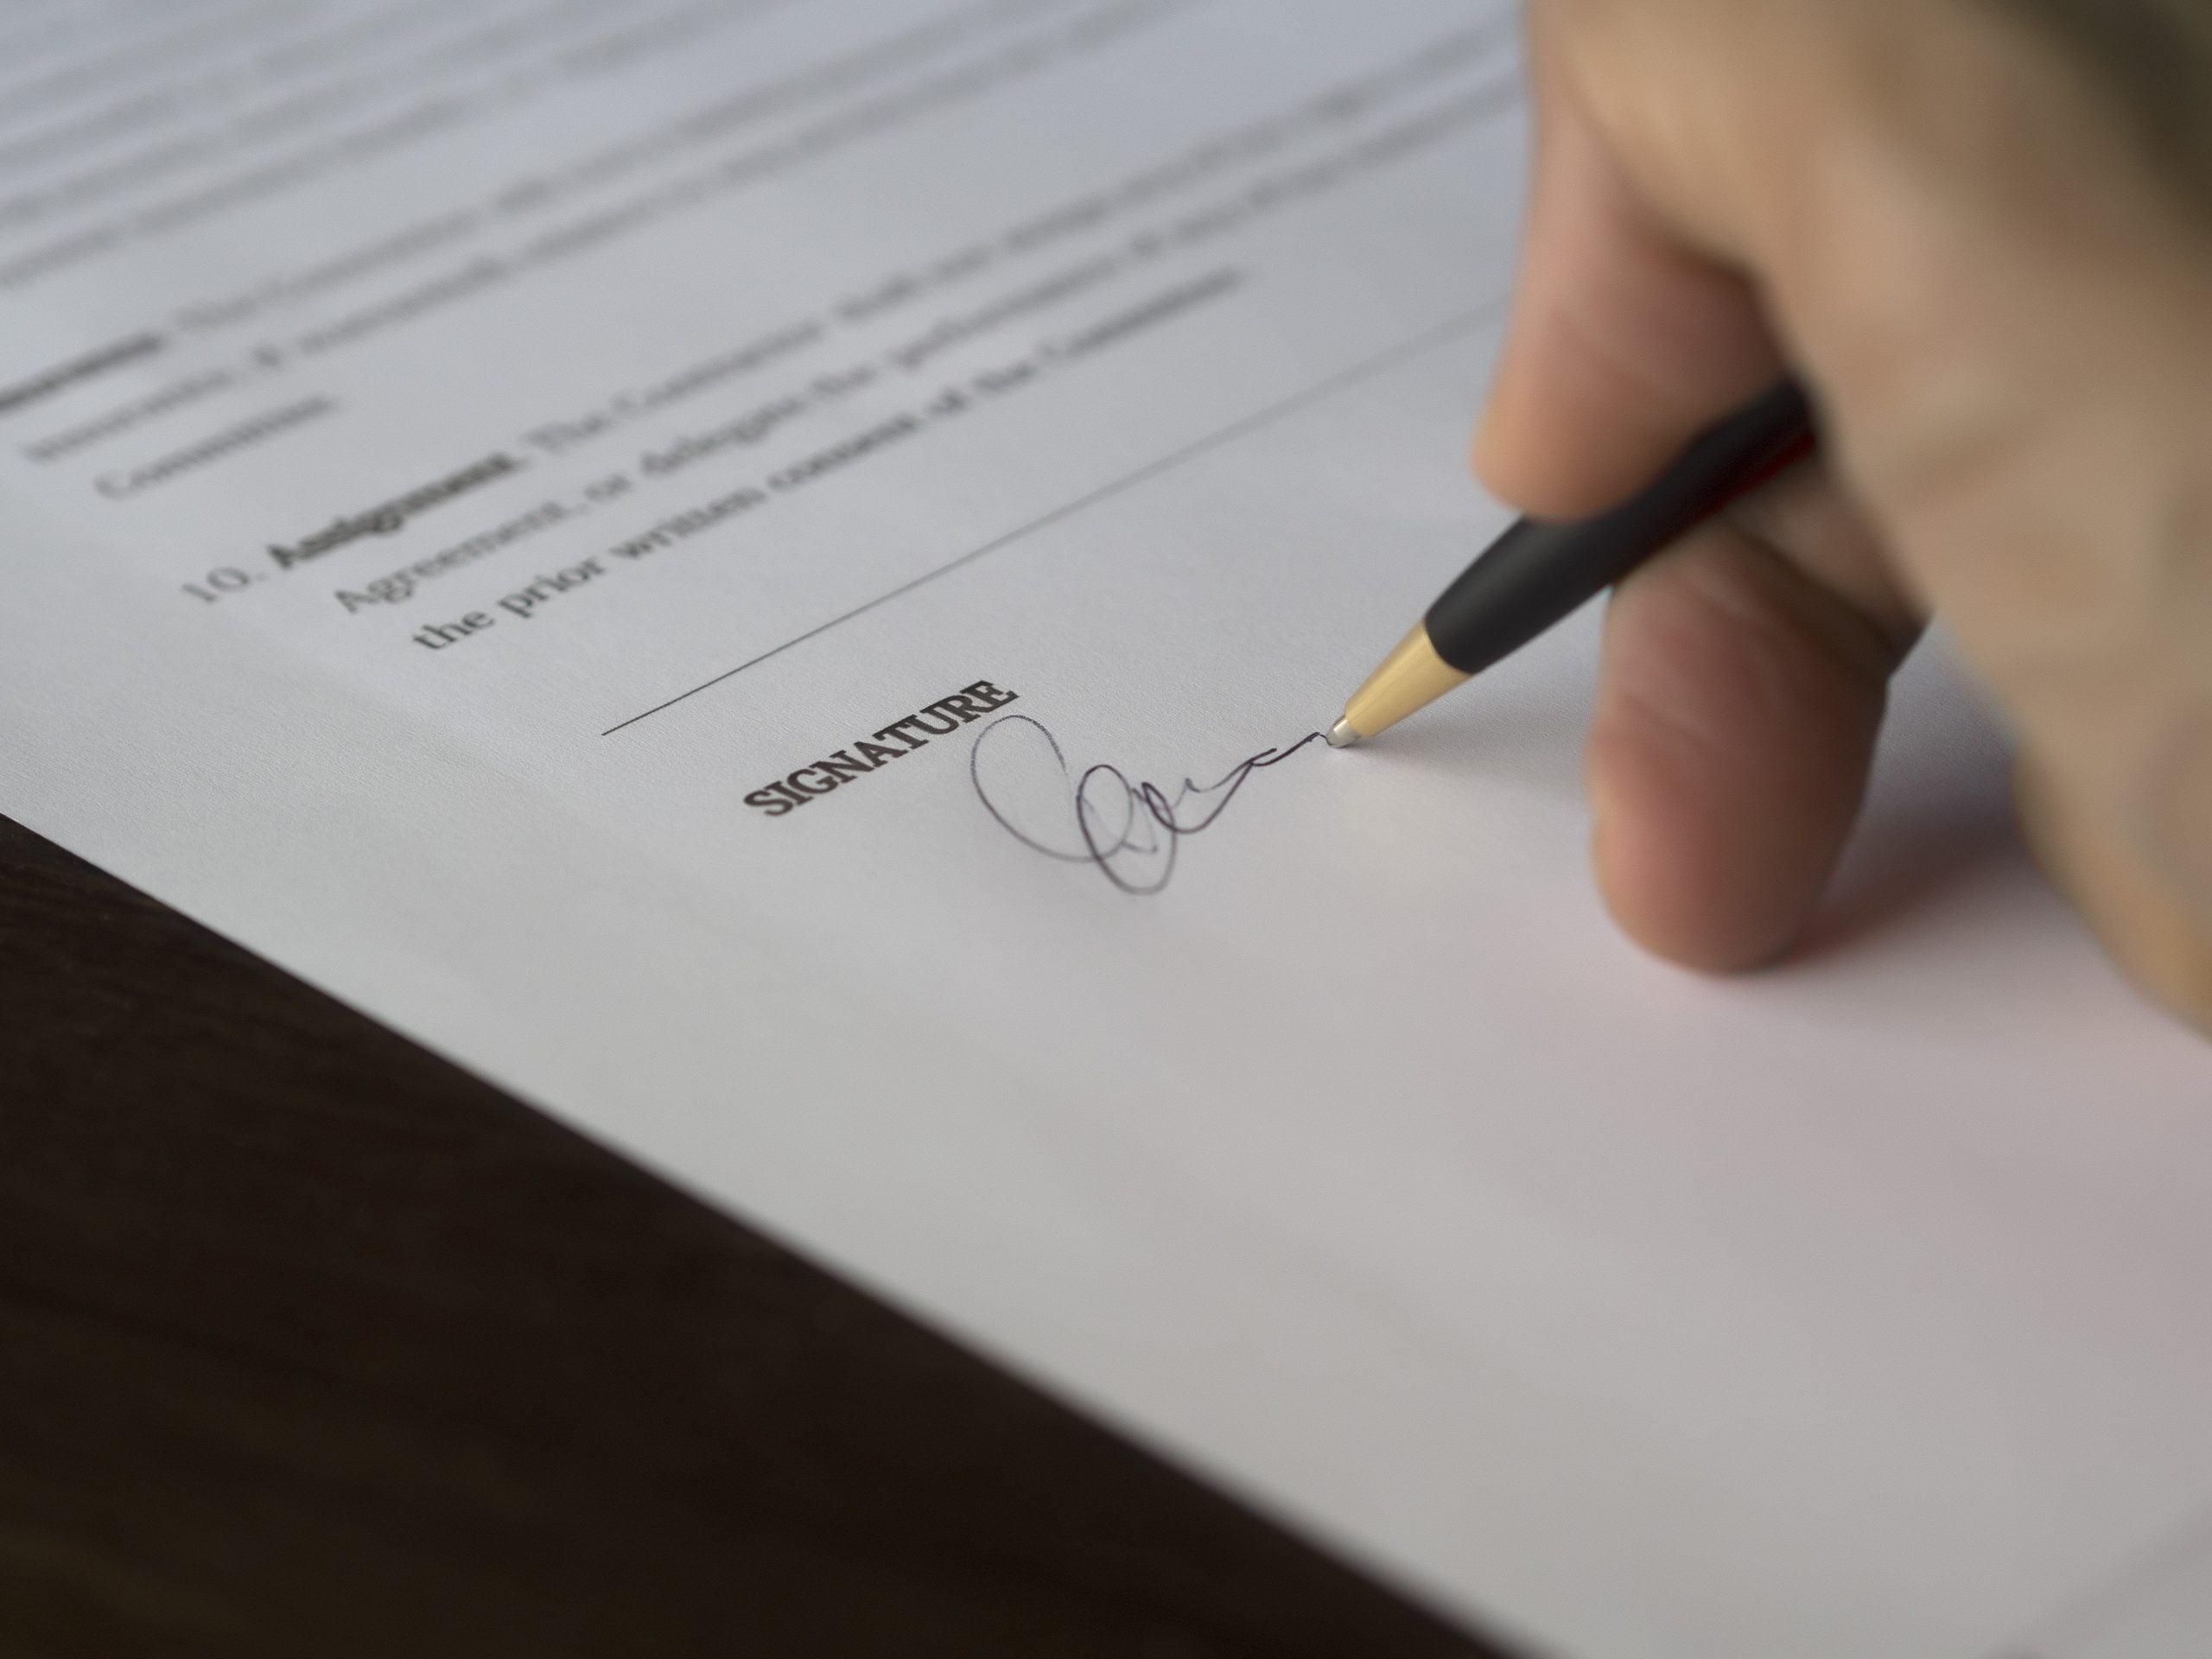 niet ondertekende verwerkersovereenkomst